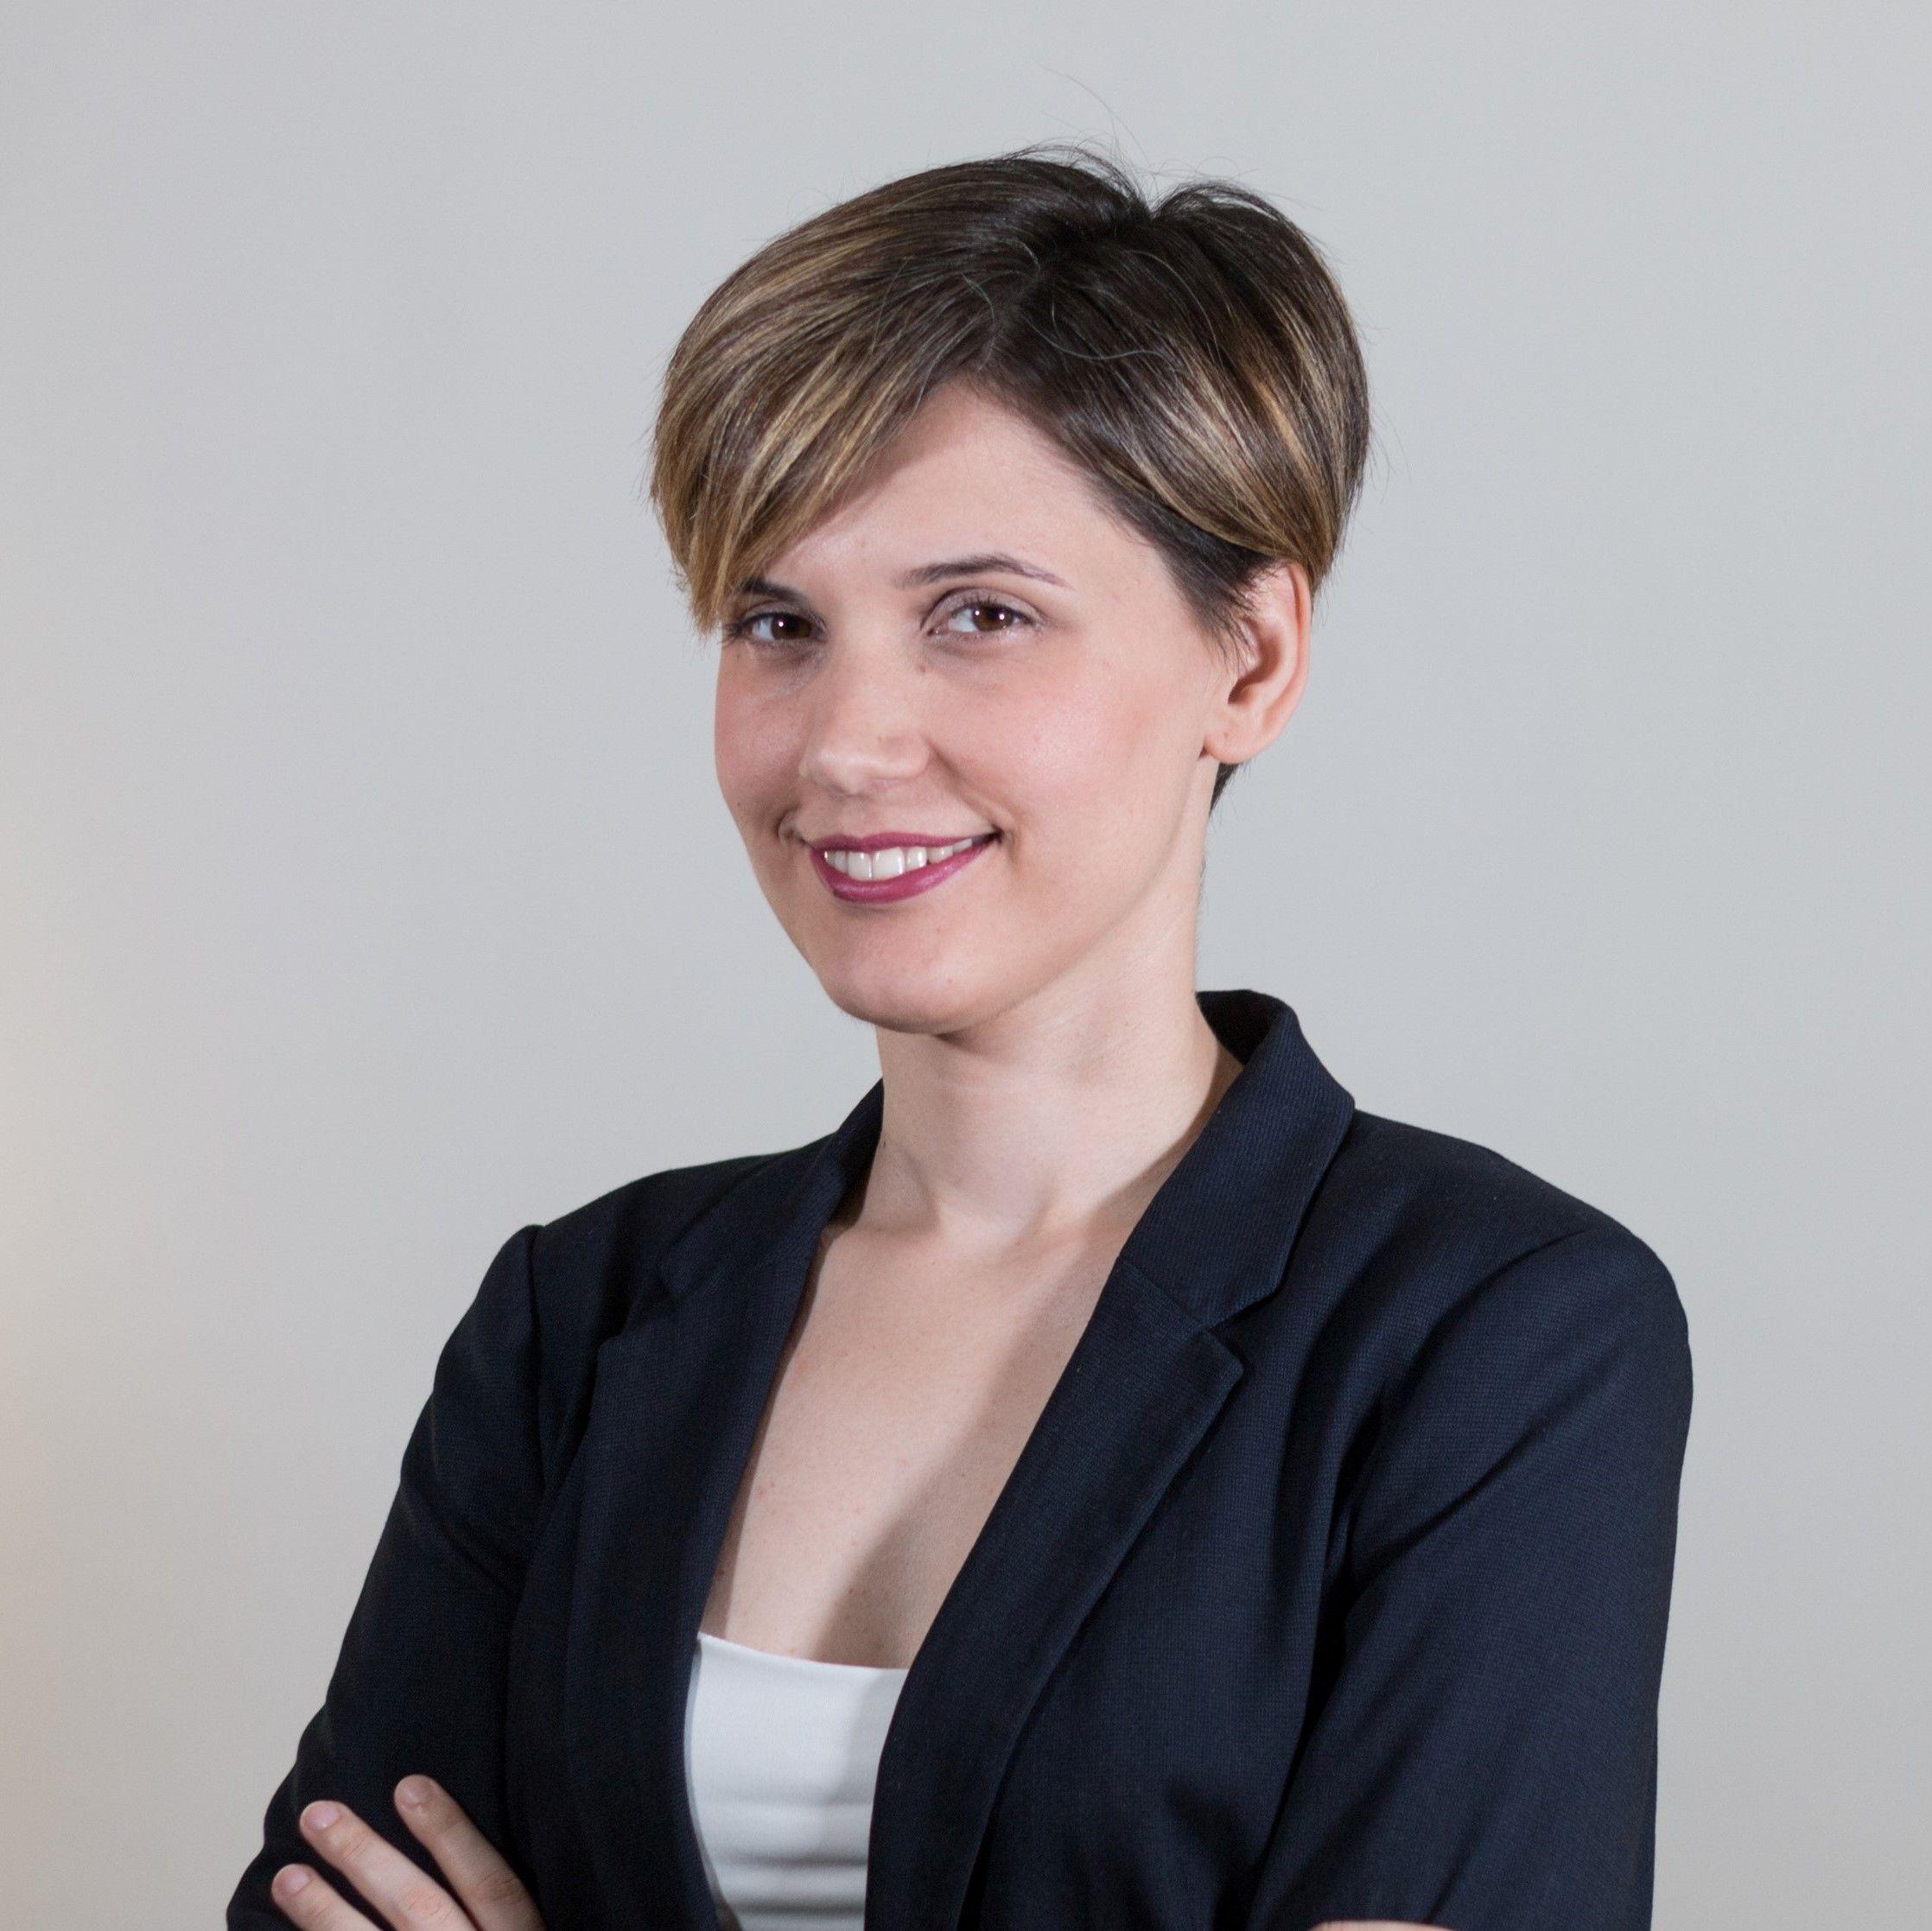 Milica Đustebek